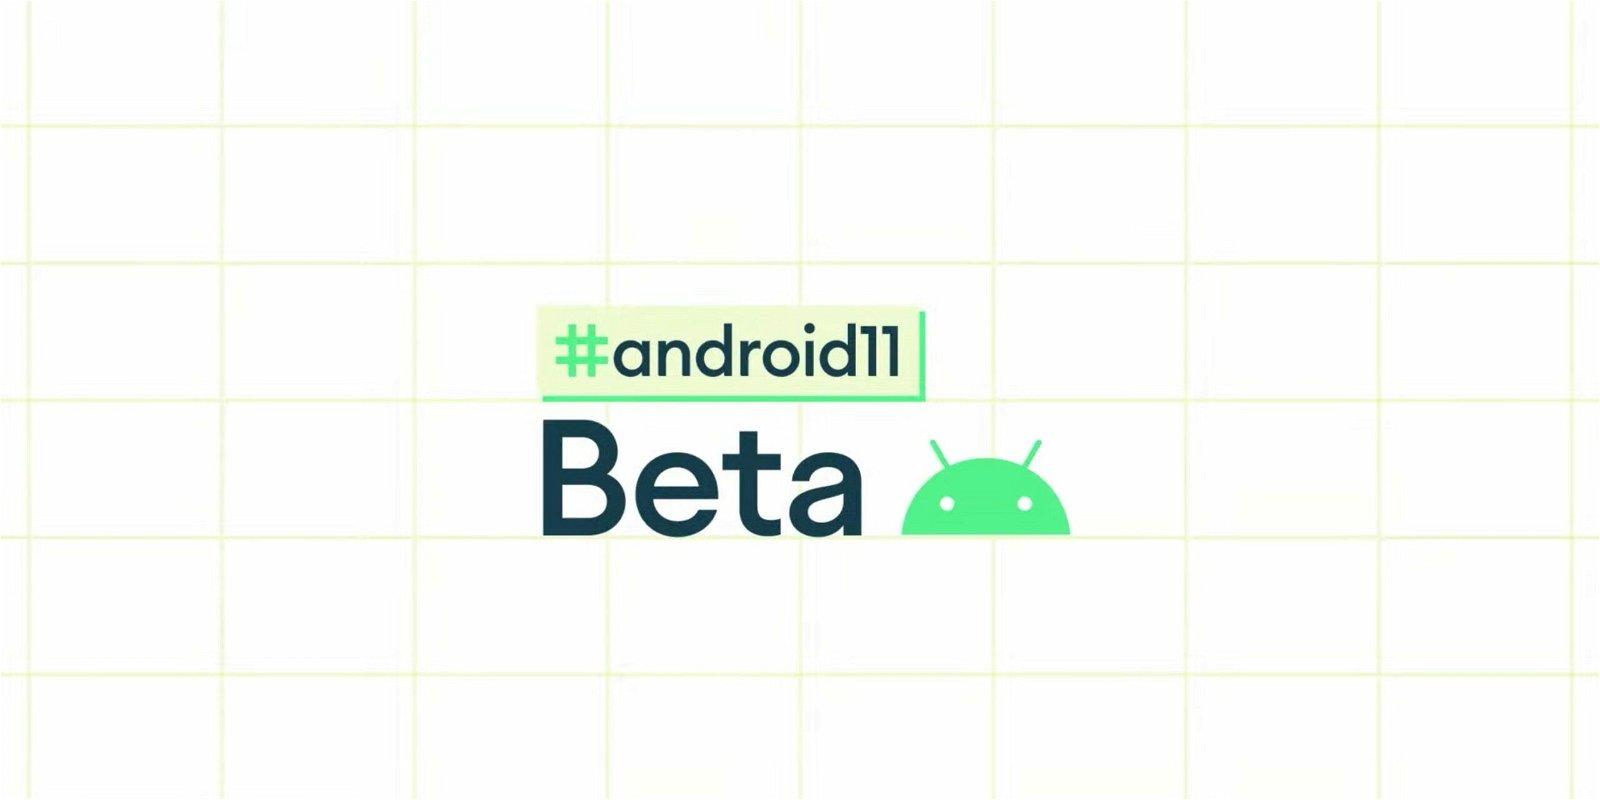 Android 11 Beta 3 for Google Pixel Phones | Download Final Beta Release 2